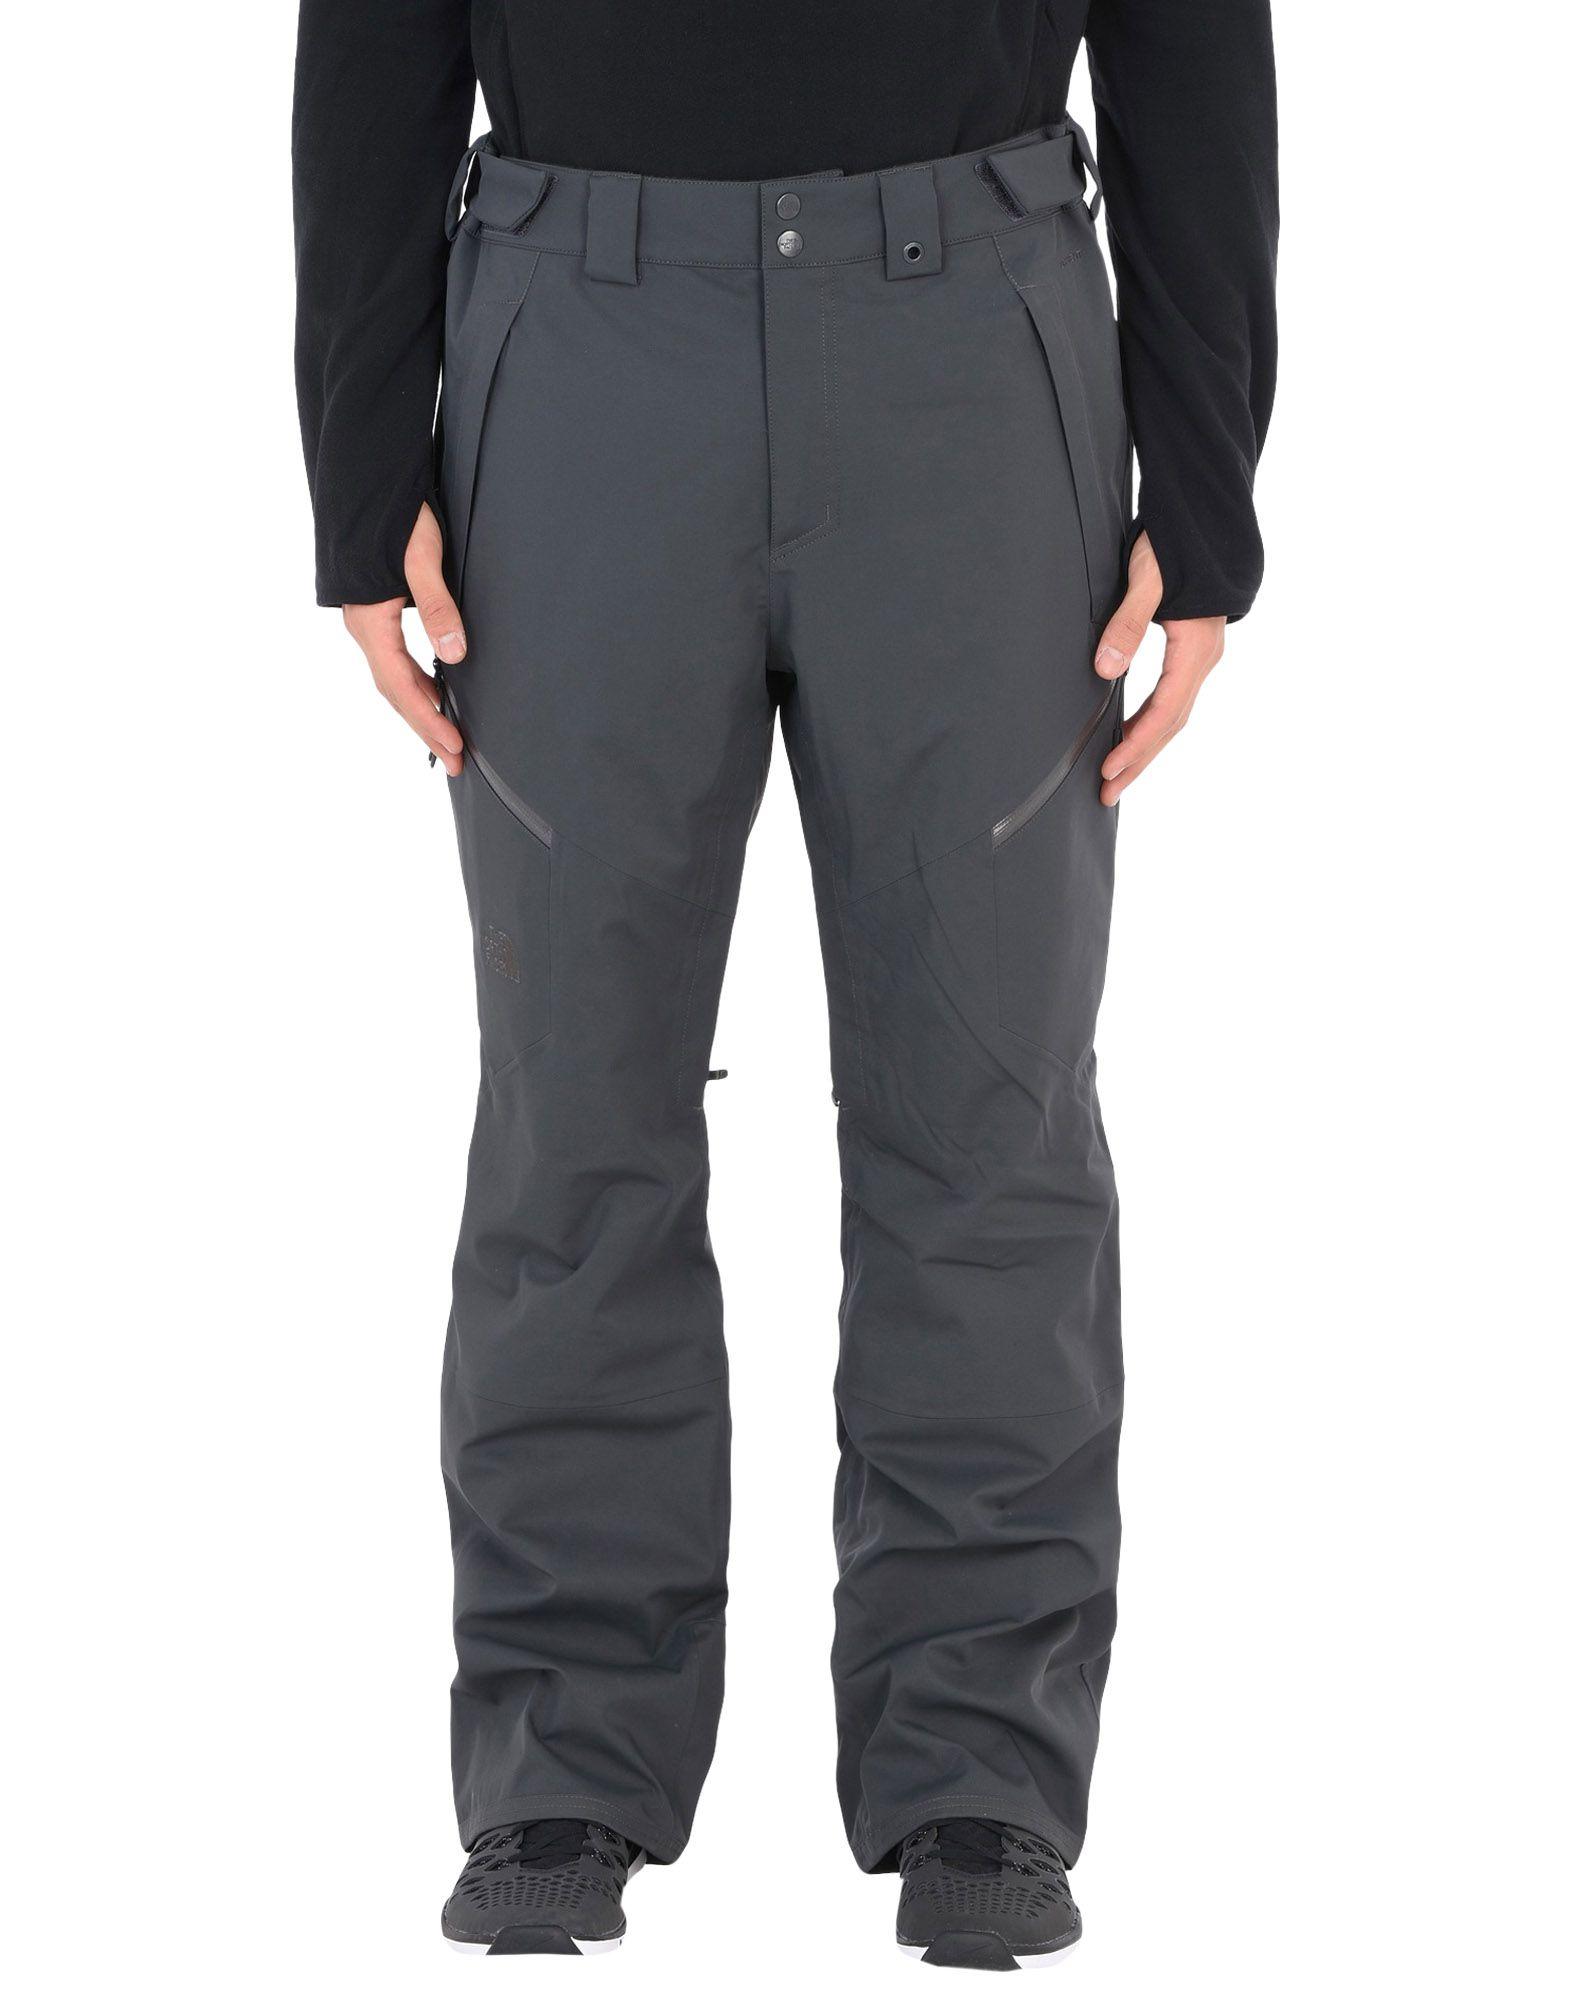 Pantalone Sportivo The North Face M Chakal Waterproof  Pant - Donna - Acquista online su